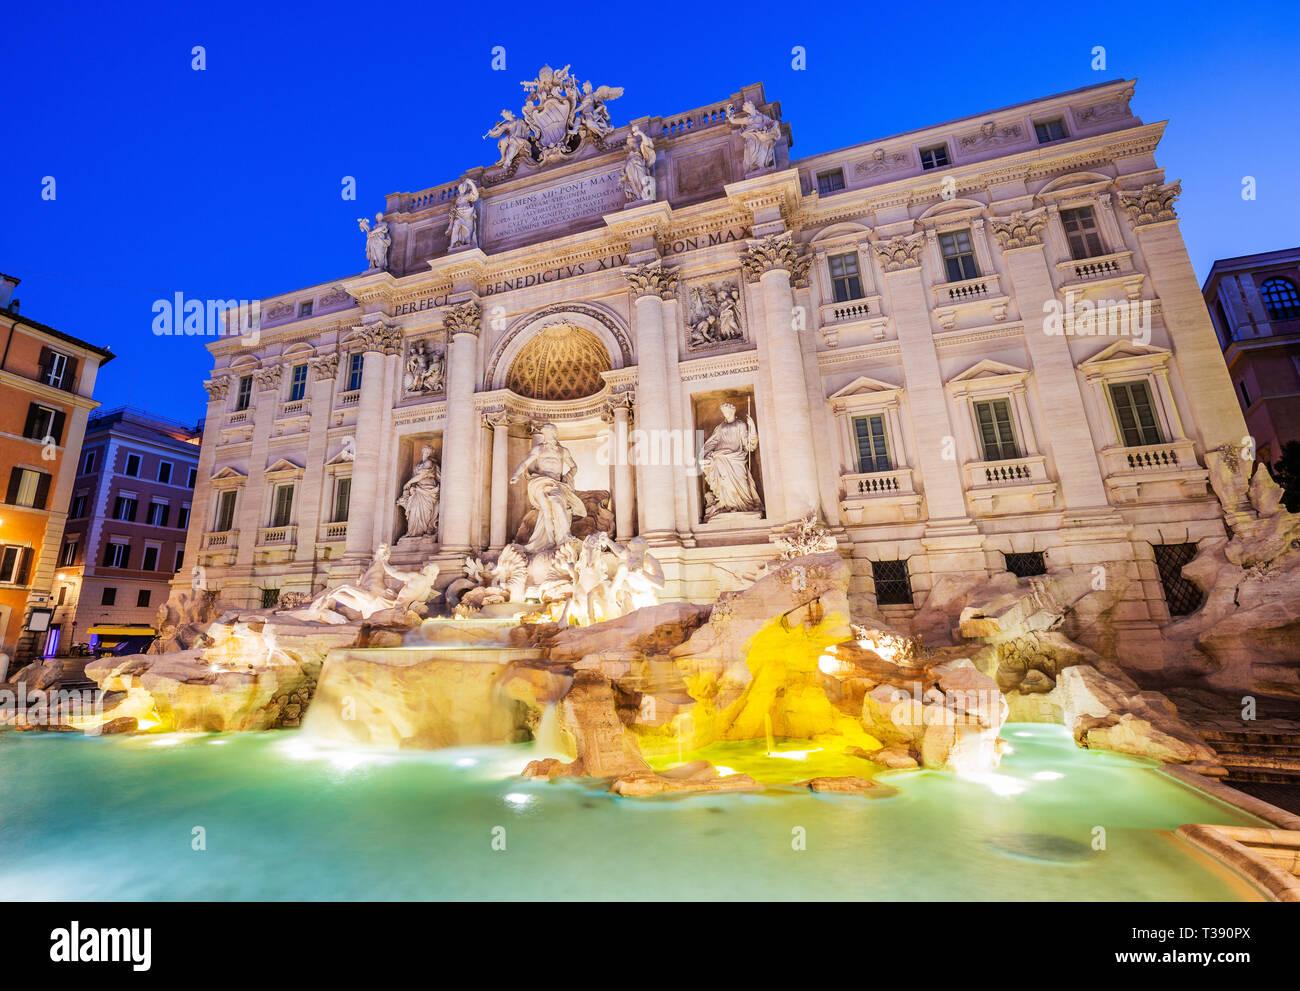 Roma, Italia. Fontana de Trevi (Fontana di Trevi) fuente más famosa de Roma. Foto de stock